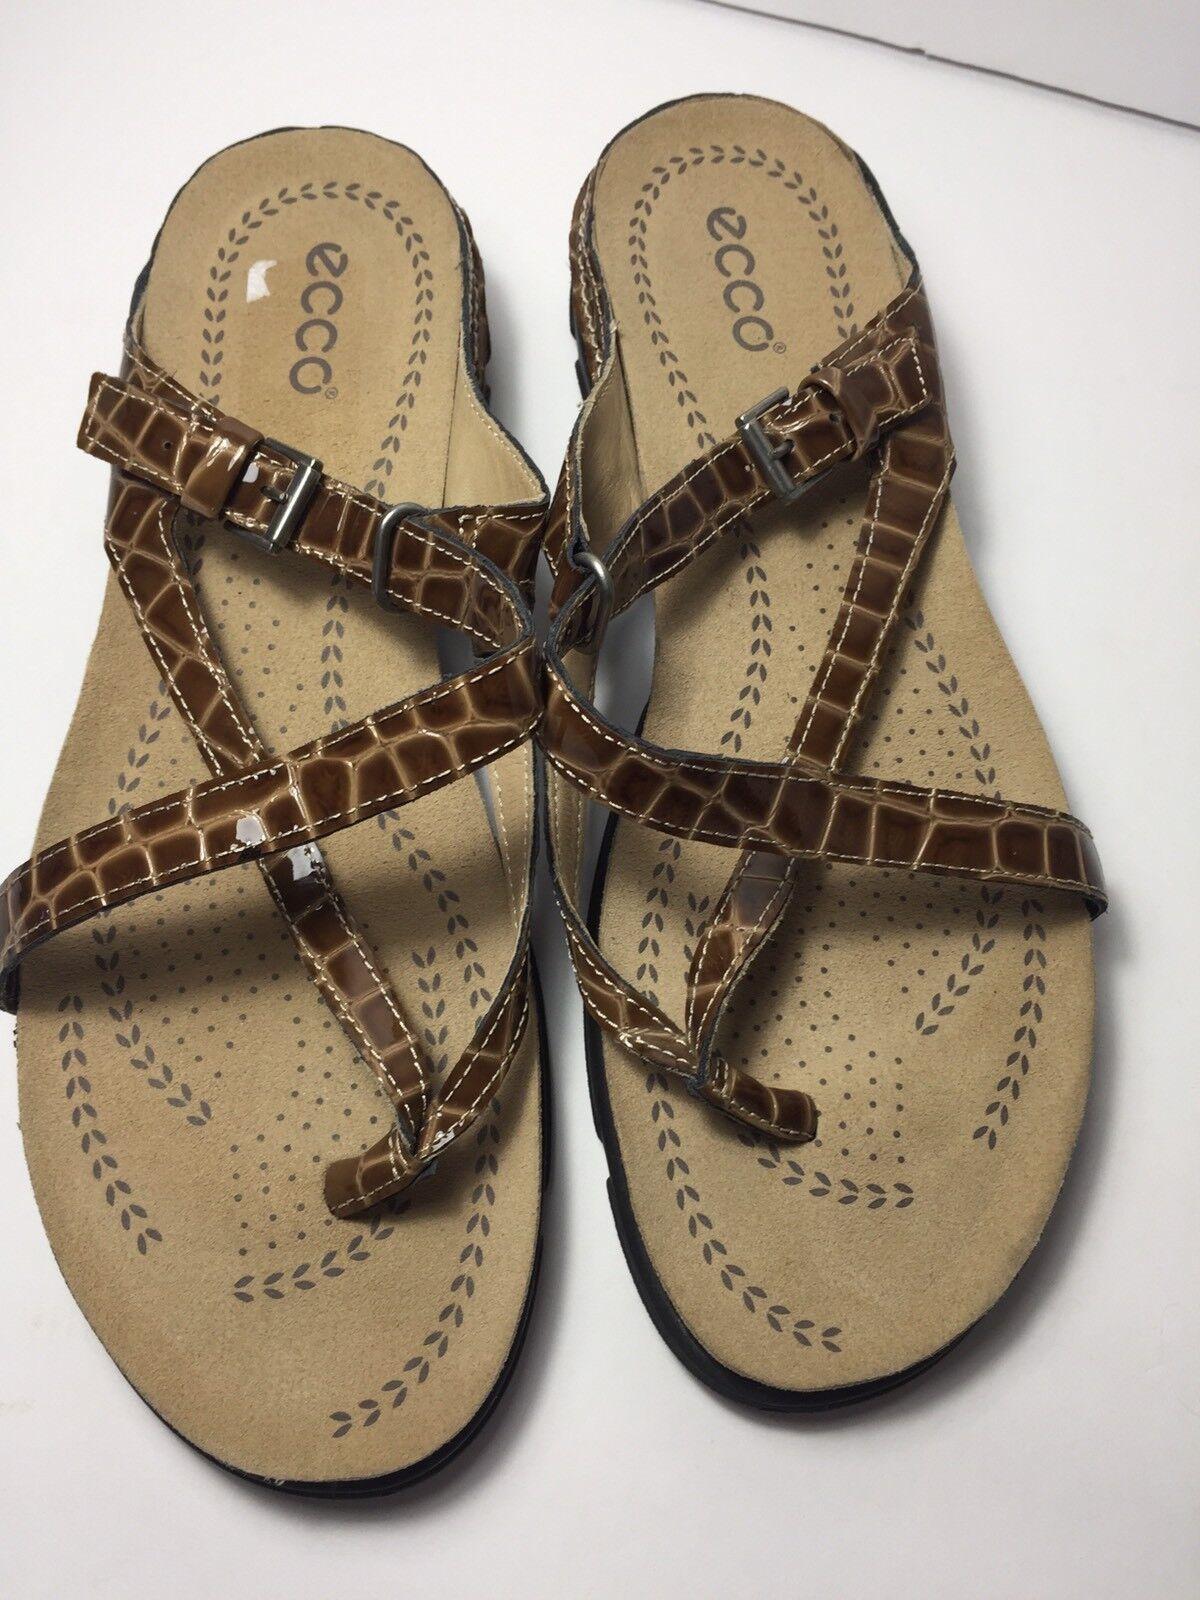 NEU ECCO Living Patent Leder Croc Strappy Thong Sandales- Braun- Größe 10